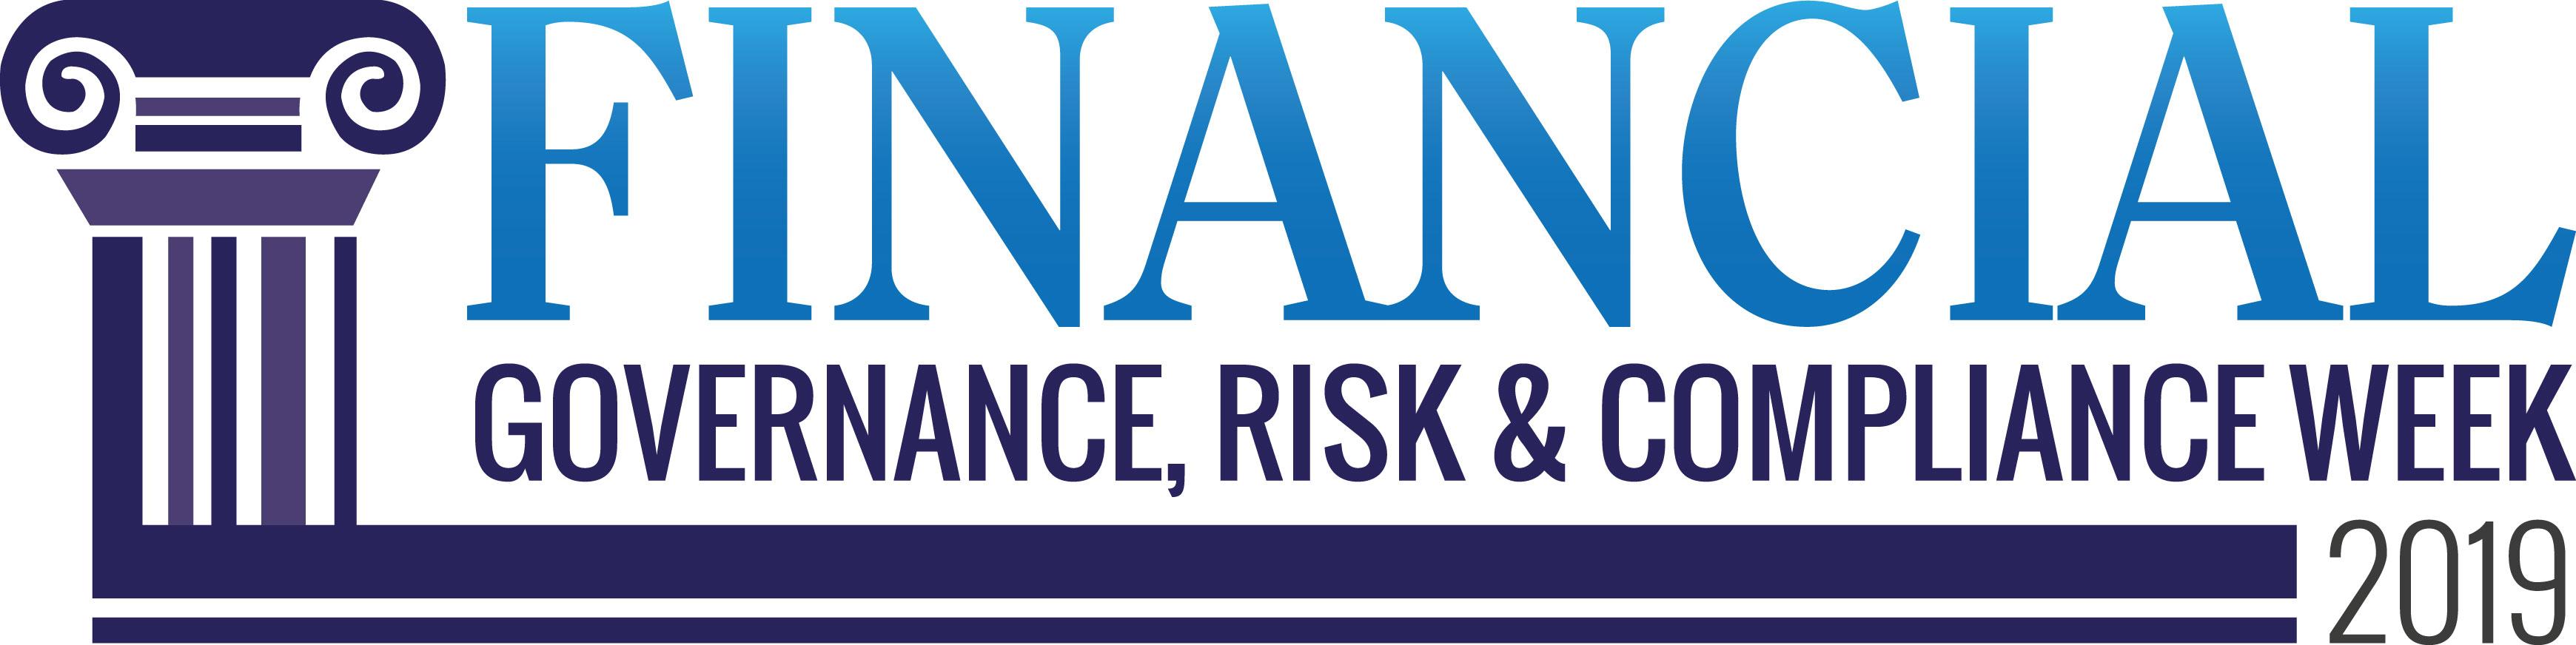 Financial Governance, Risk & Compliance Week Asia 2019 Agenda